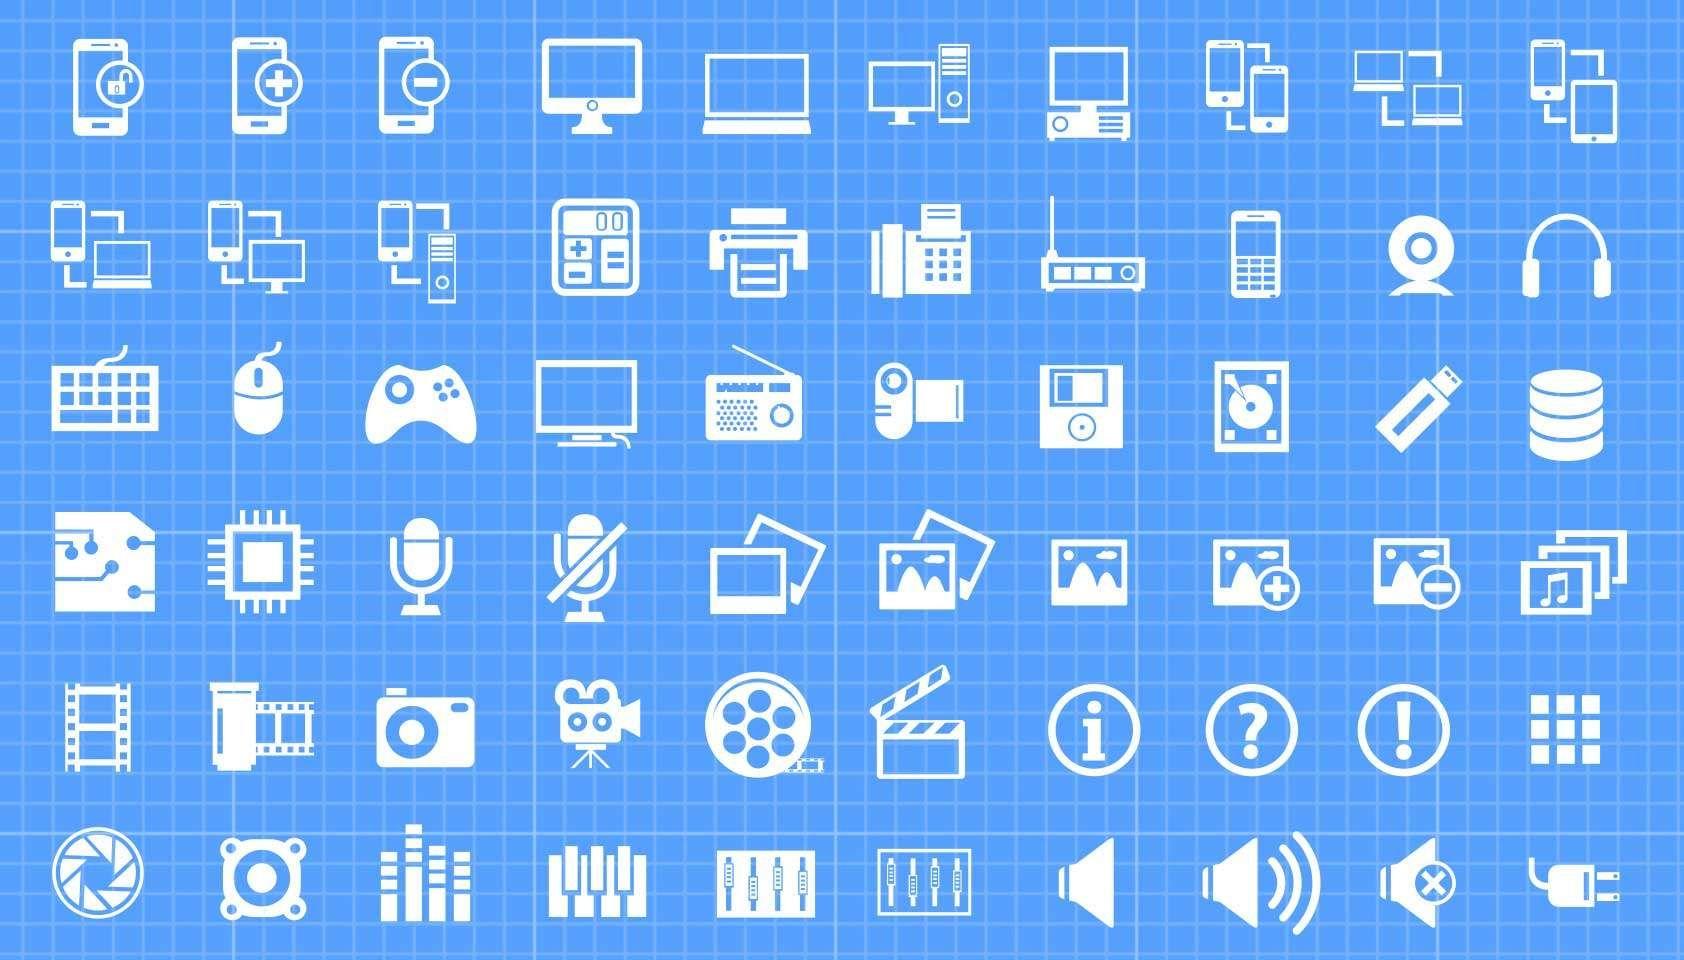 Free download 500 Vector Mega Icon Pack Free web design